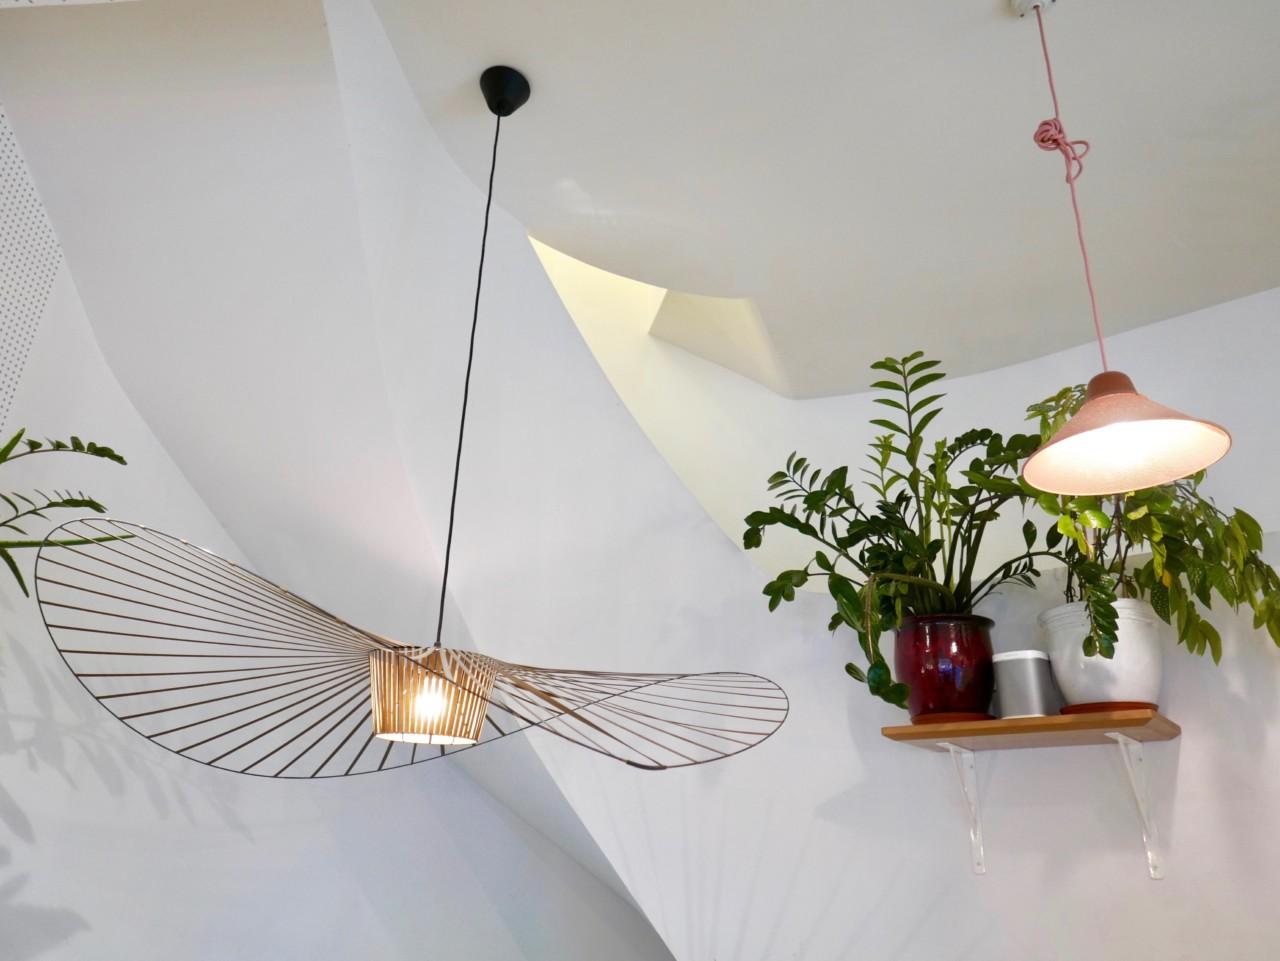 judy-paris-lamper-st-germain-lokal-plantebasert